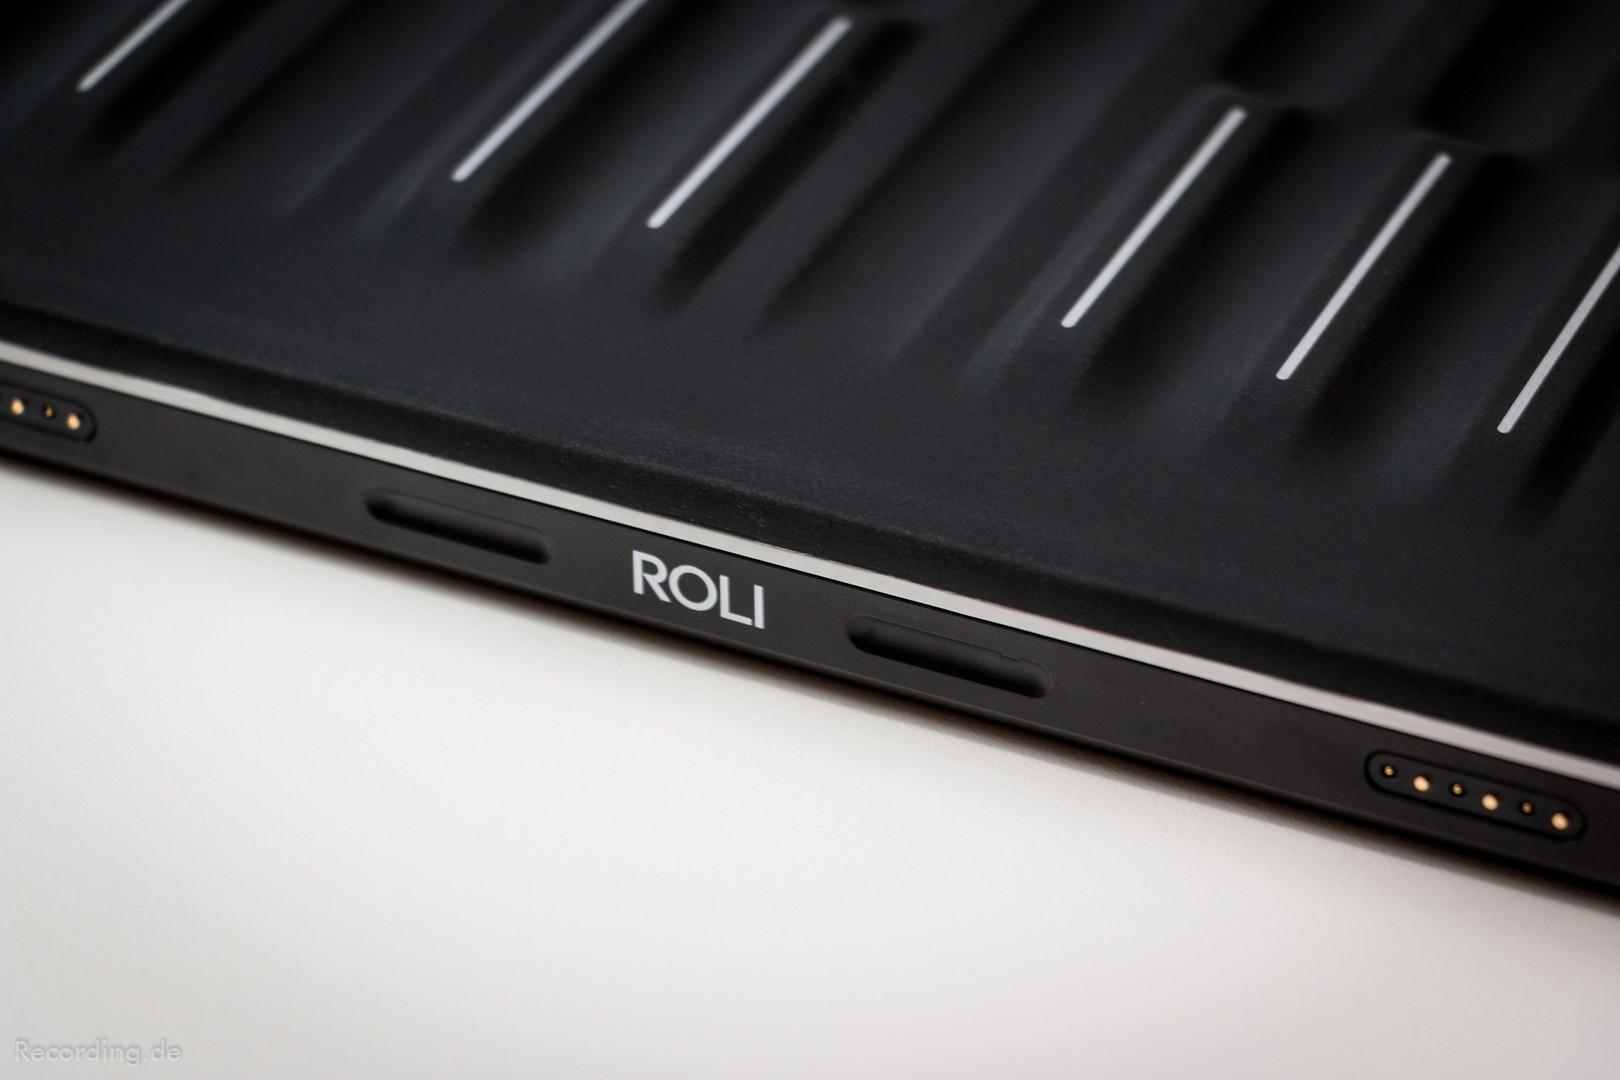 Roli-Kit-009.jpg